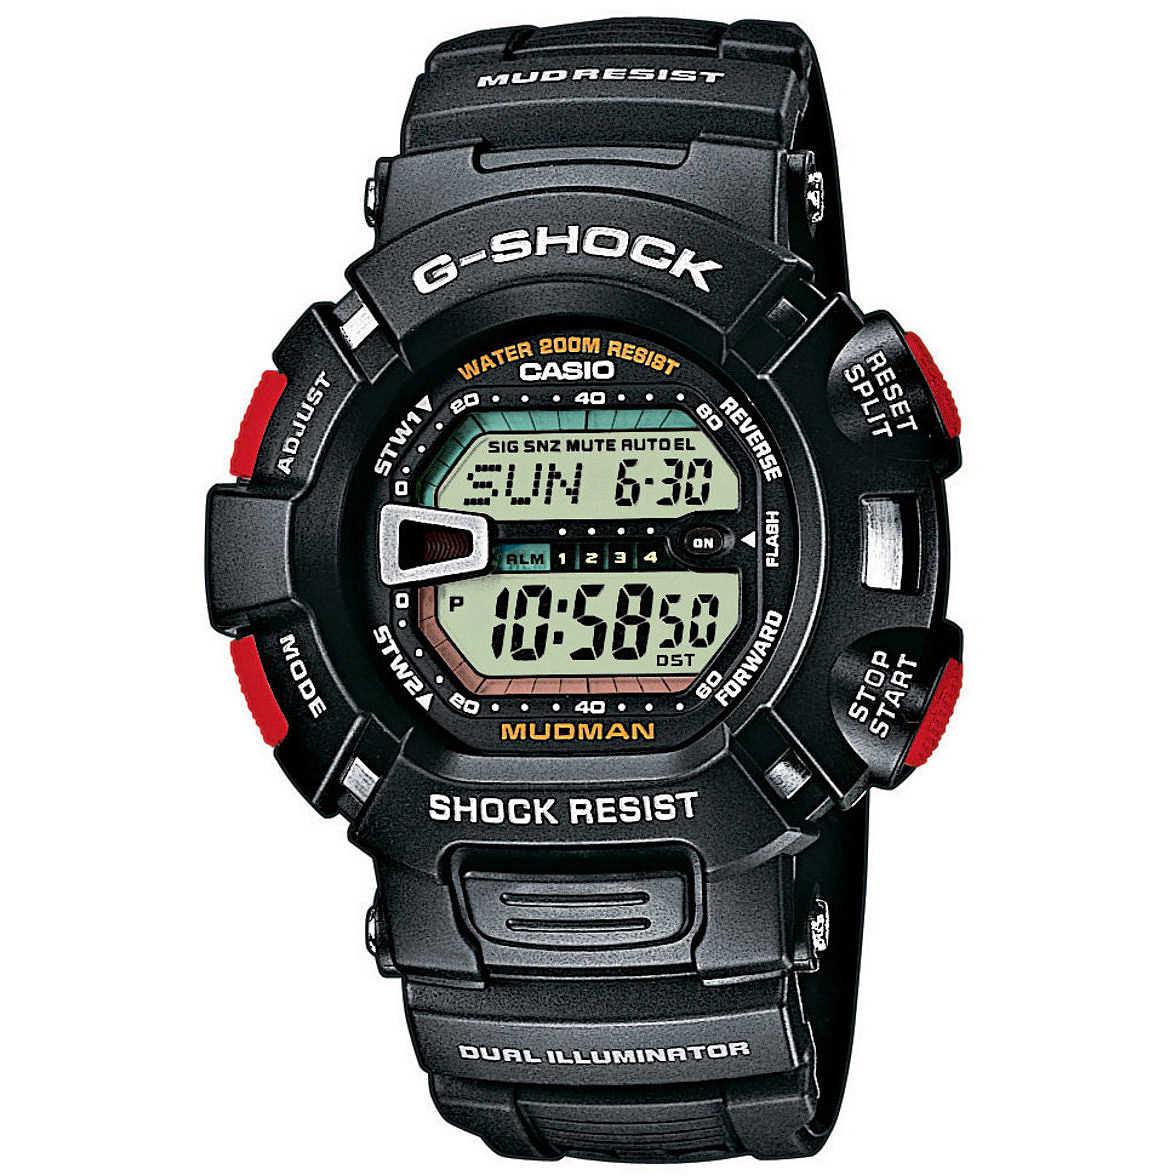 4e70d83be8c8 Orologio Cronografo Uomo Casio G-Shock G-9000-1VER digitali Casio